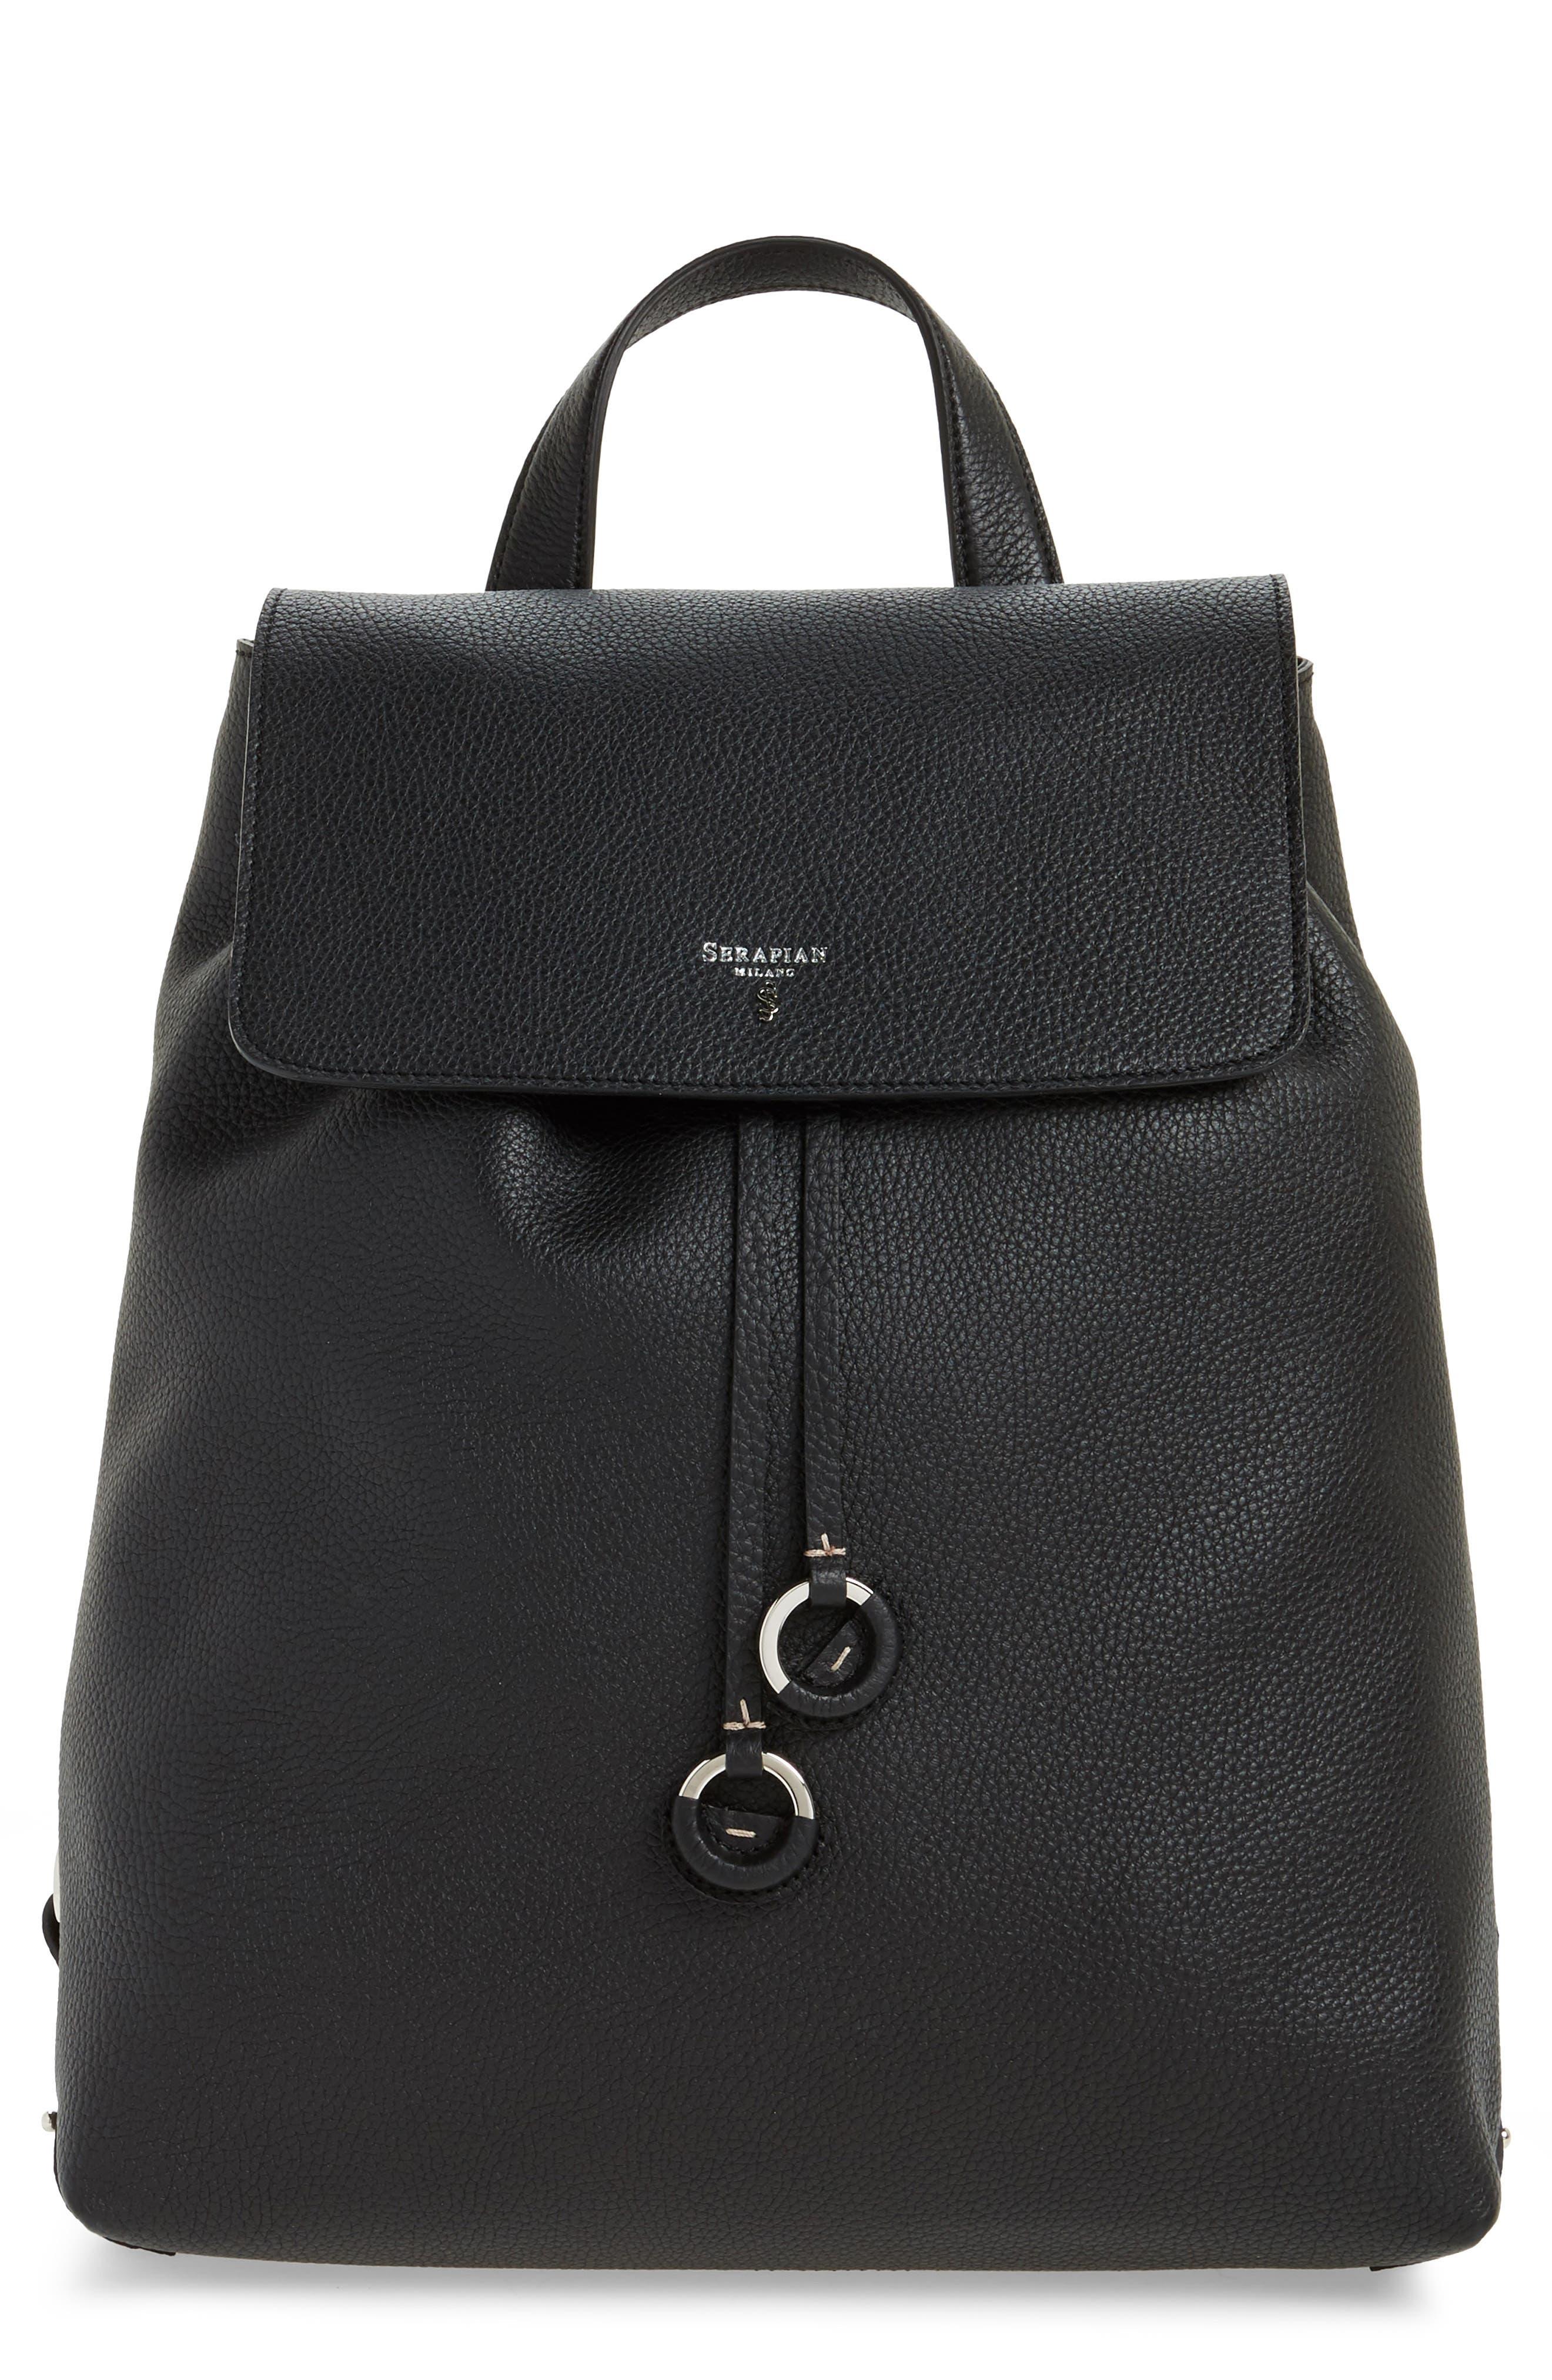 Carmen Cachemire Leather Backpack,                         Main,                         color, Black